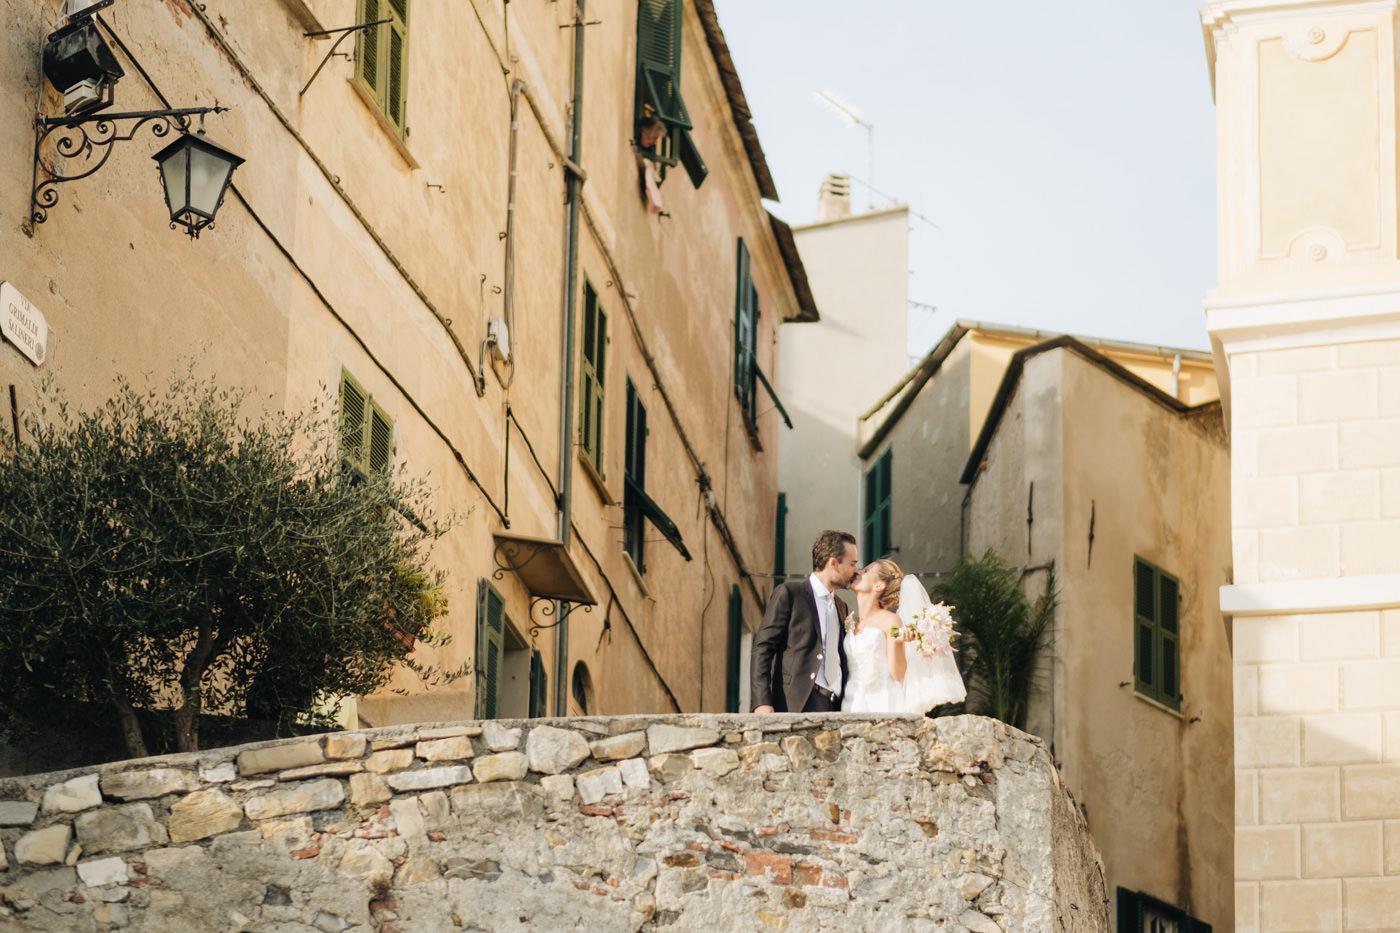 matrimoni_all_italiana_fotografo_matrimonio_cinque_terre-40.jpg